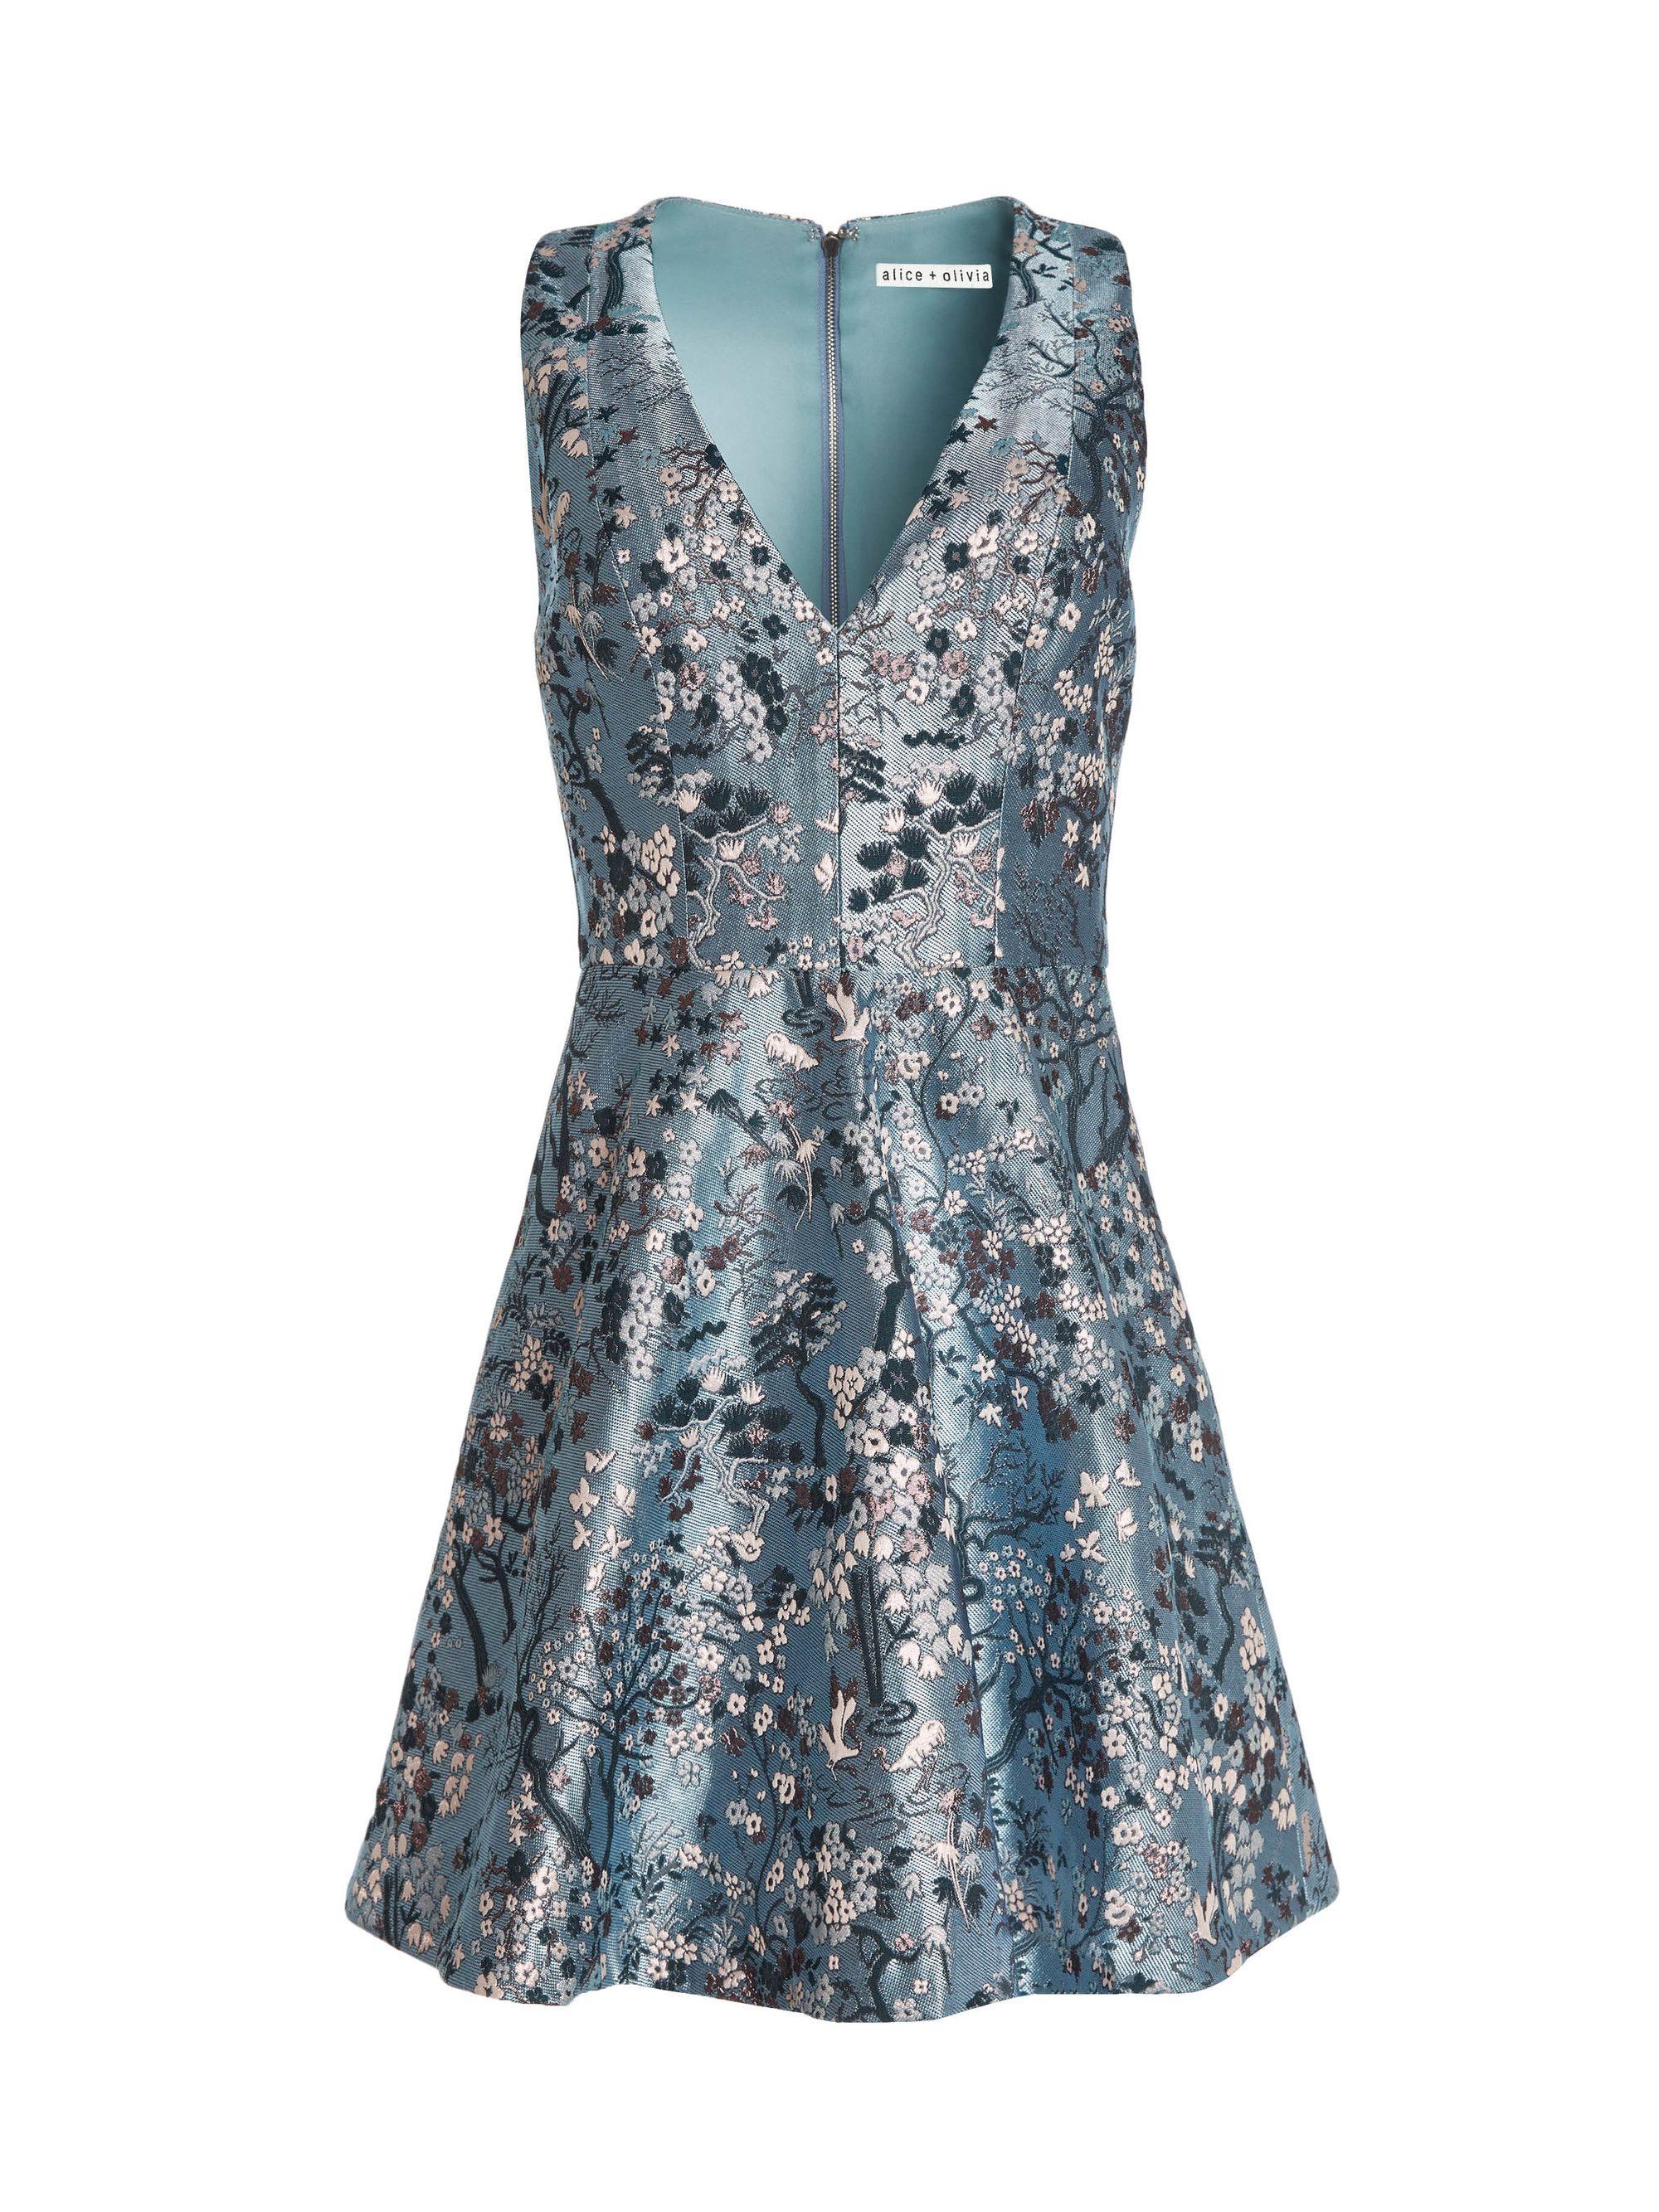 3bb84949738b TENNIE V-NECK PARTY DRESS by Alice + Olivia | Dresses | Dresses ...